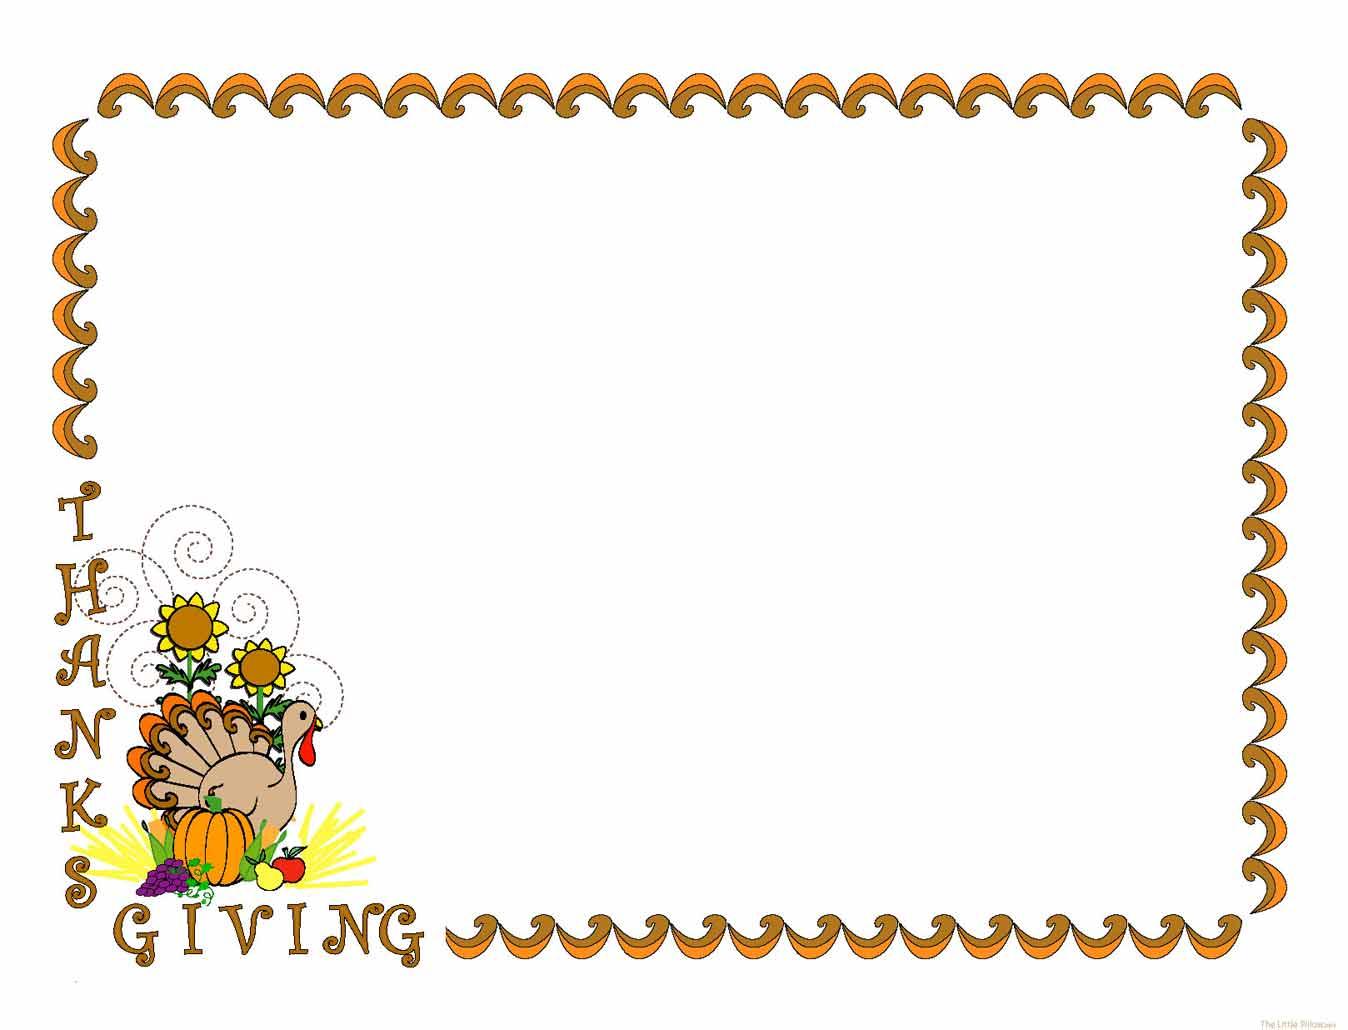 Thanksgiving page borders clipart jpg freeuse Free Thanksgiving Cliparts Borders, Download Free Clip Art ... jpg freeuse